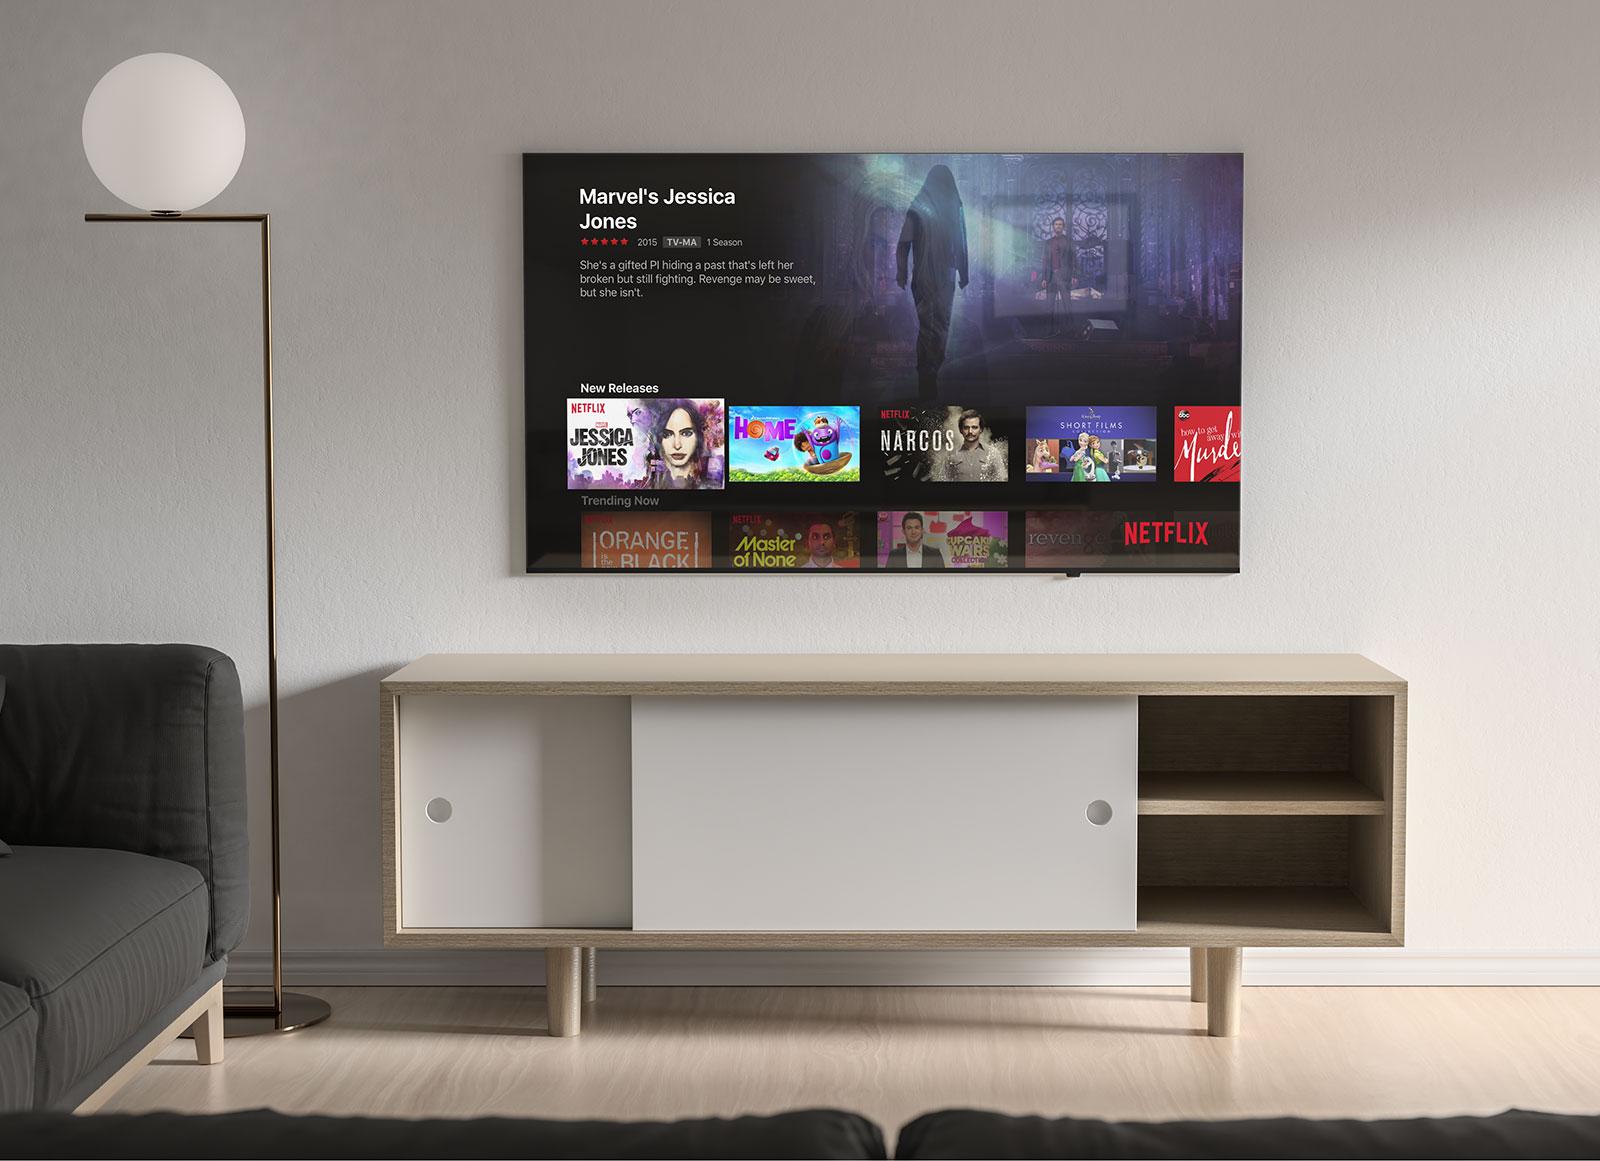 Free Living Room 4k Tv Screen Mockup Psd Good Mockups